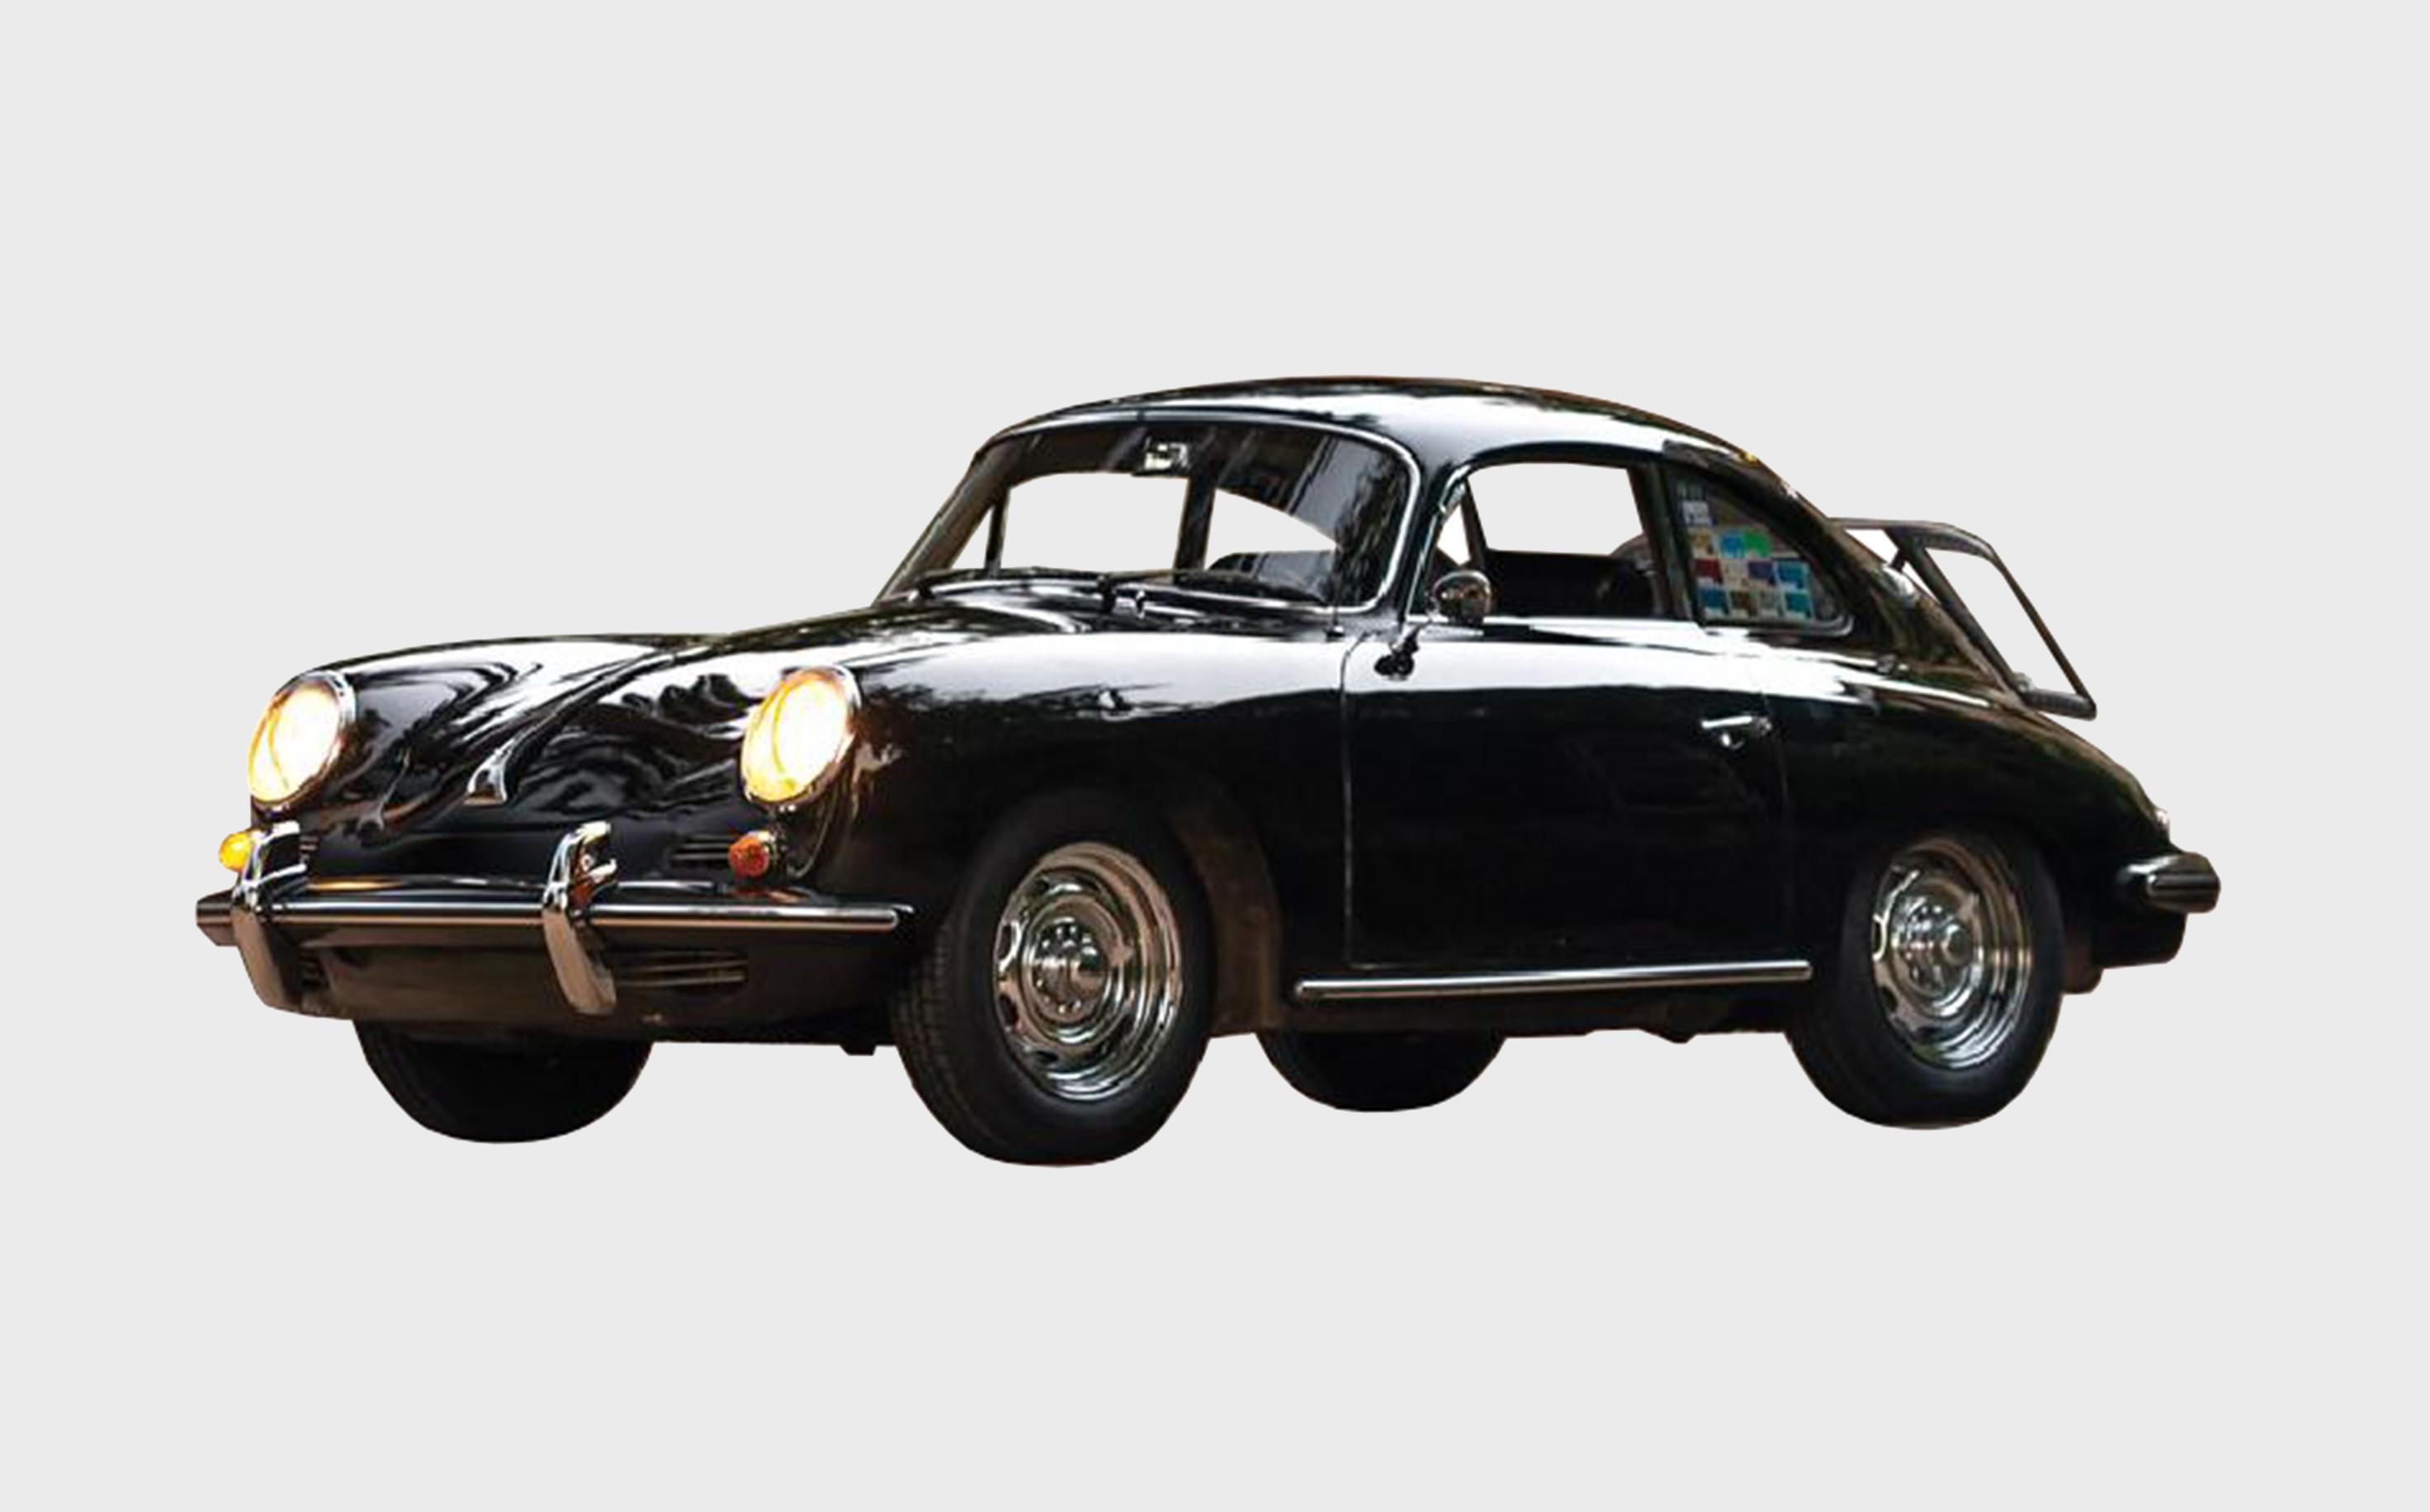 1963 Porsche 356 B 1600 'Sunroof' Coupe by Reutter